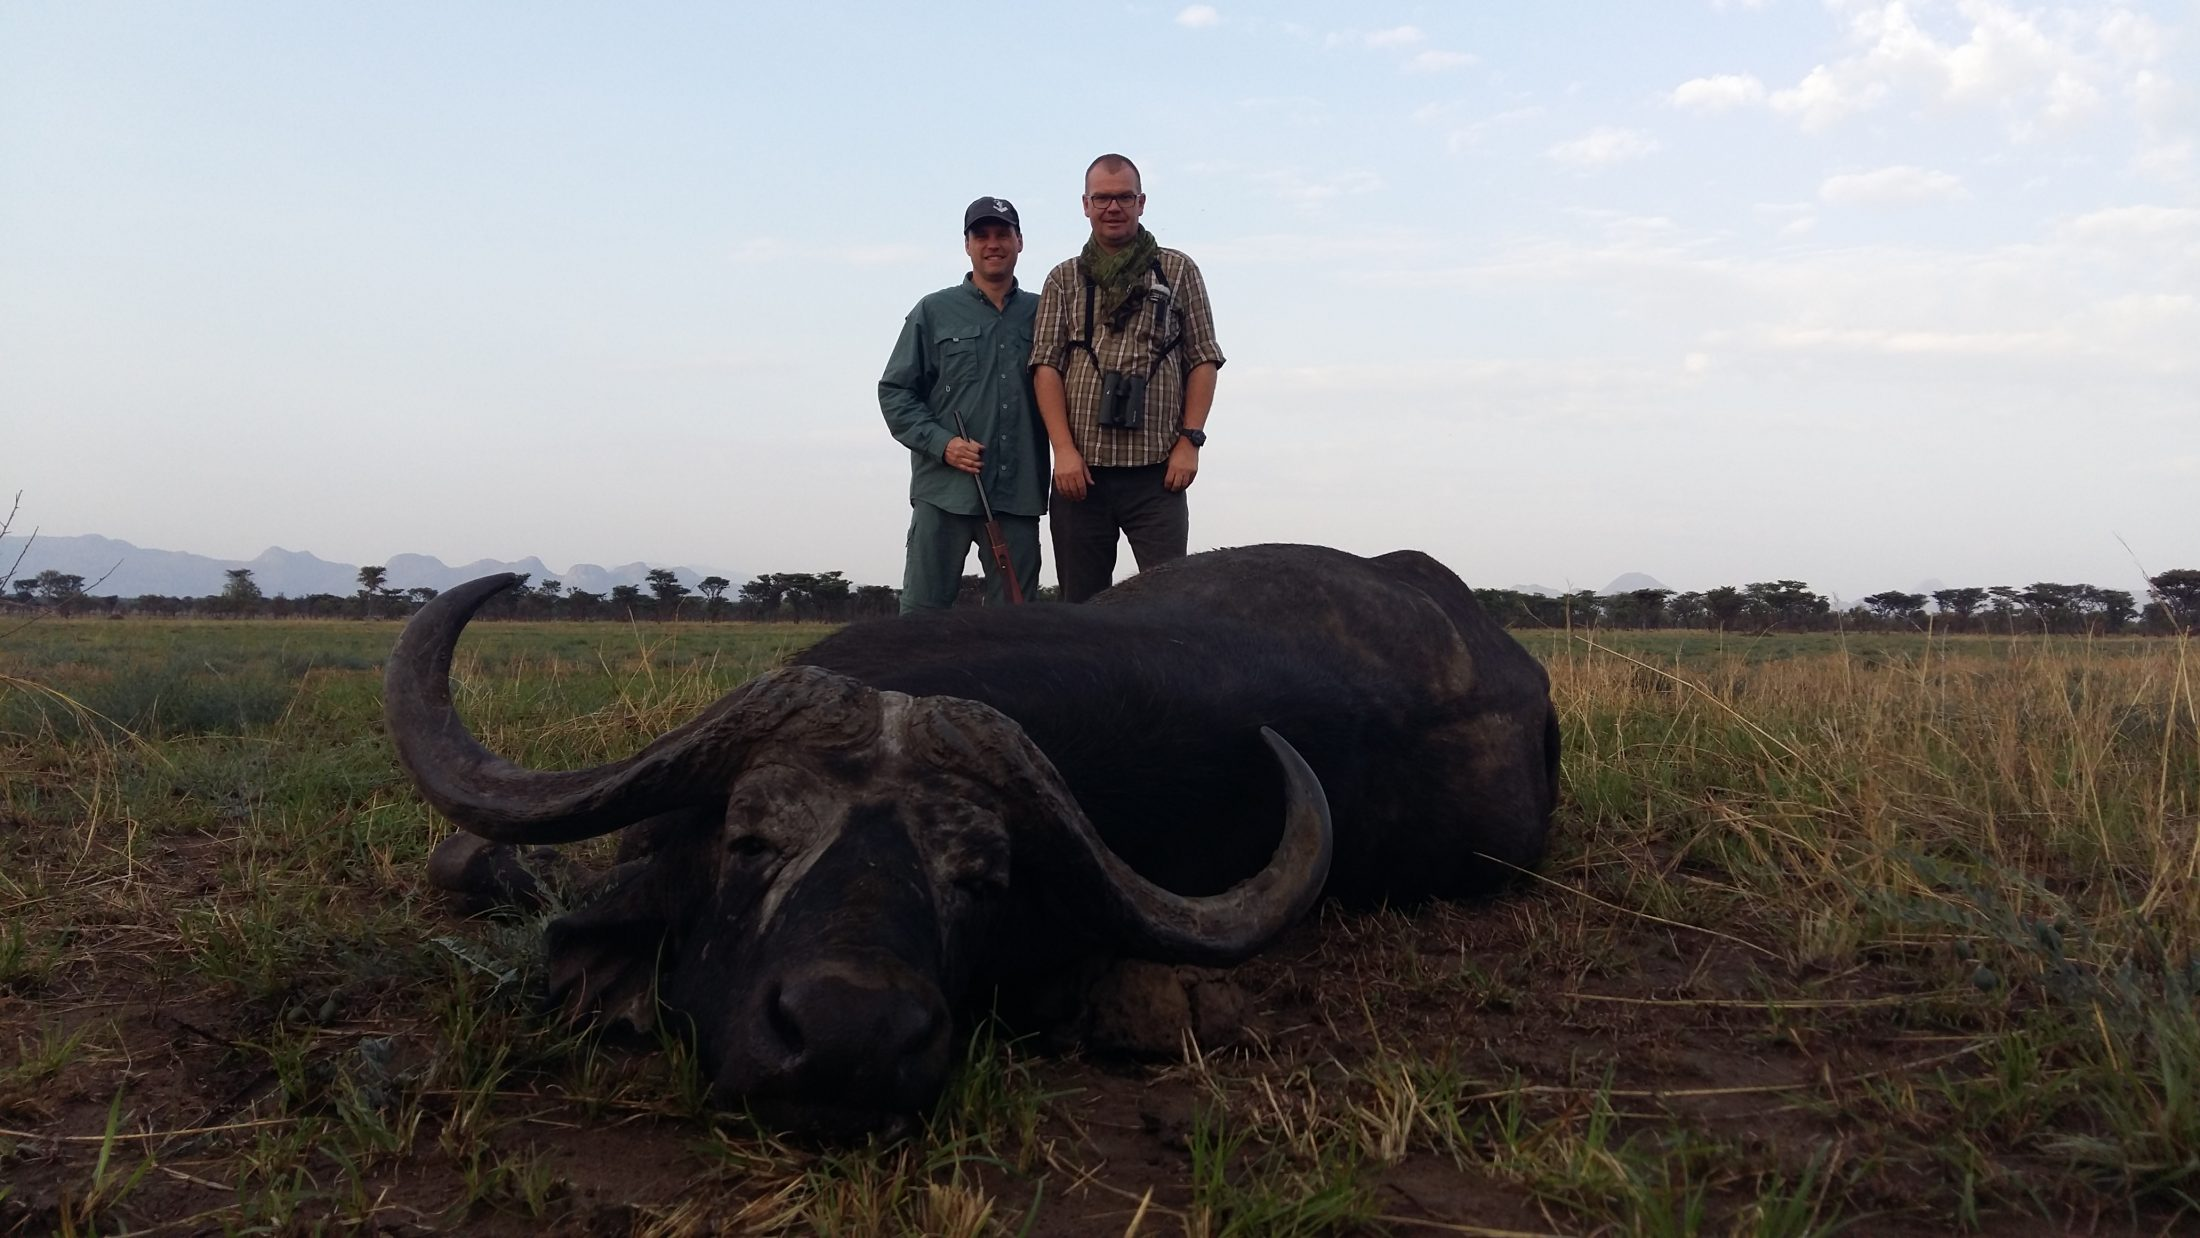 uganda wildlife safaris trophy photos 2017 (43) buffalo